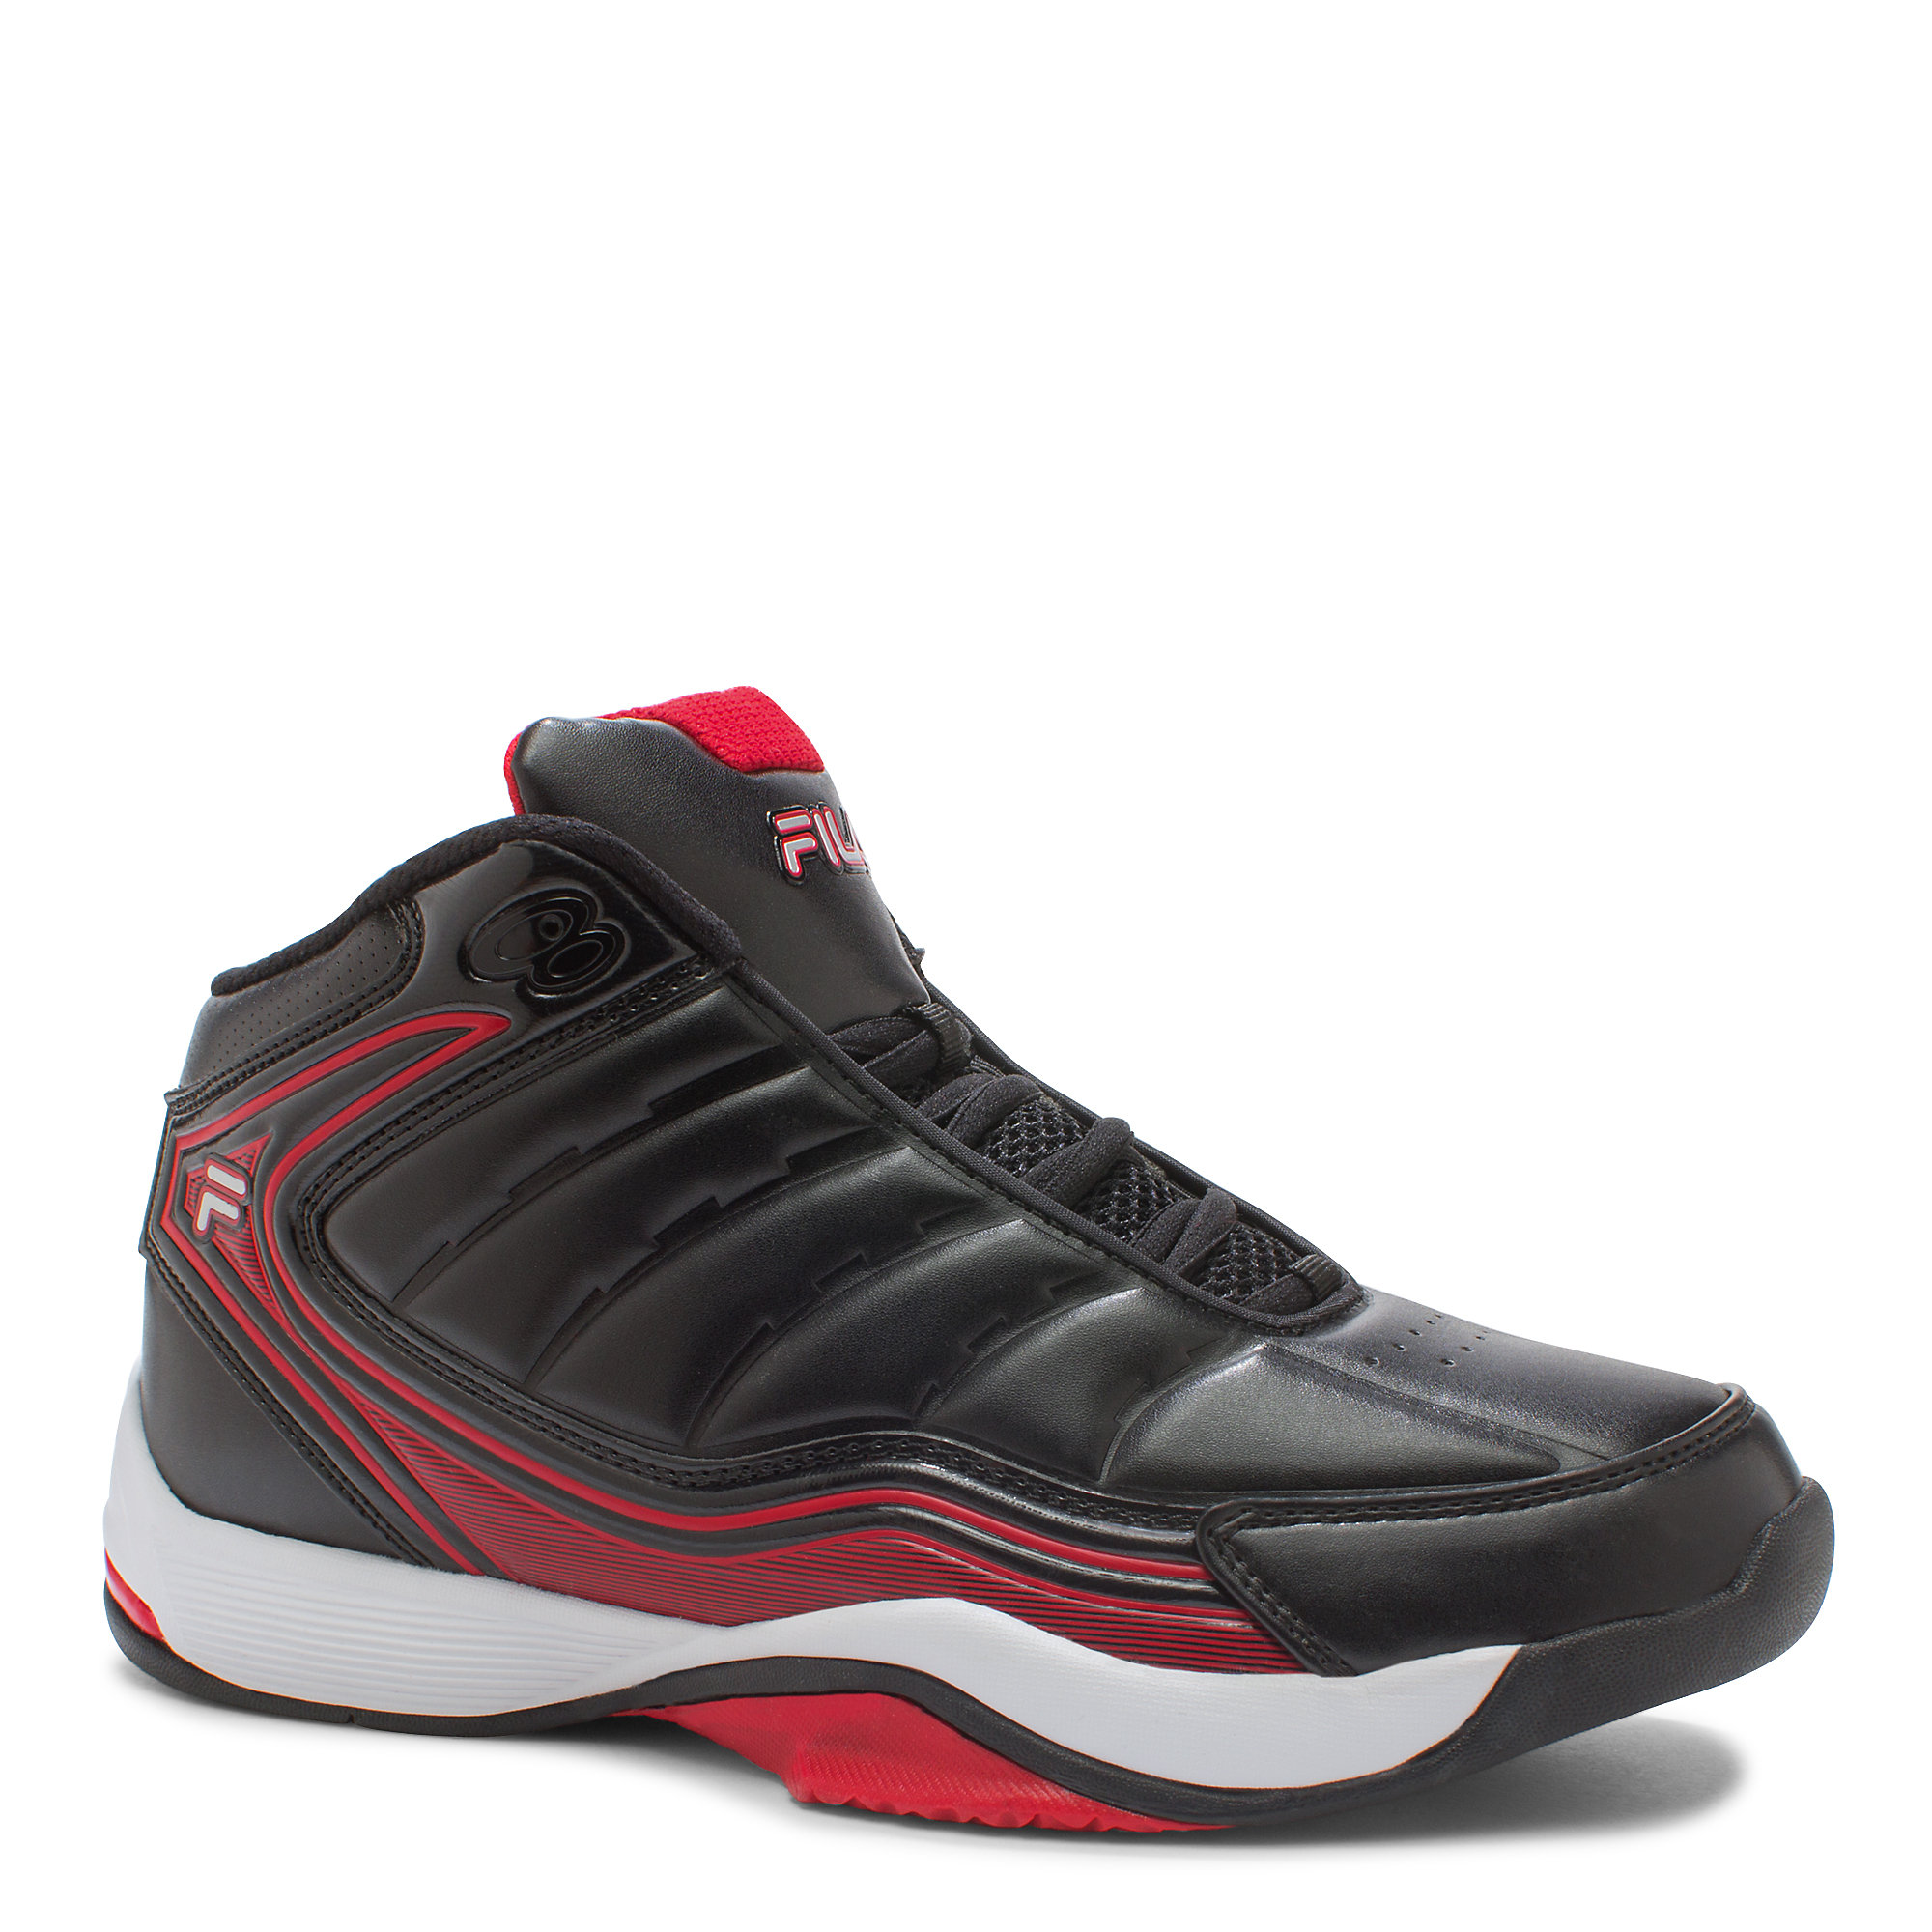 fila men 39 s breakaway 7 basketball sneakers ebay. Black Bedroom Furniture Sets. Home Design Ideas